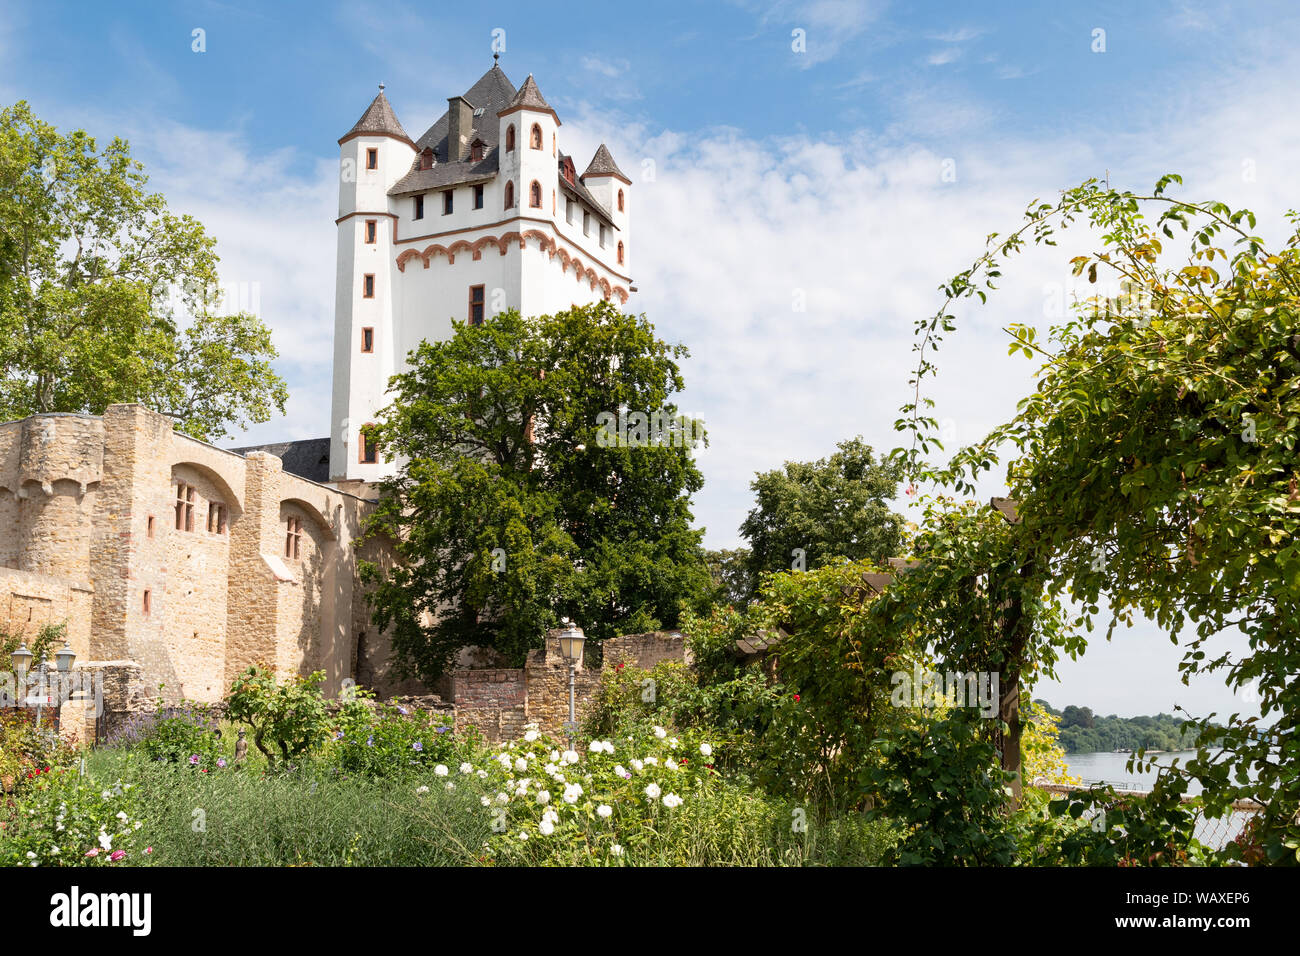 Eltville Electoral Castle, Eltville am Rhein, Germany Stock Photo